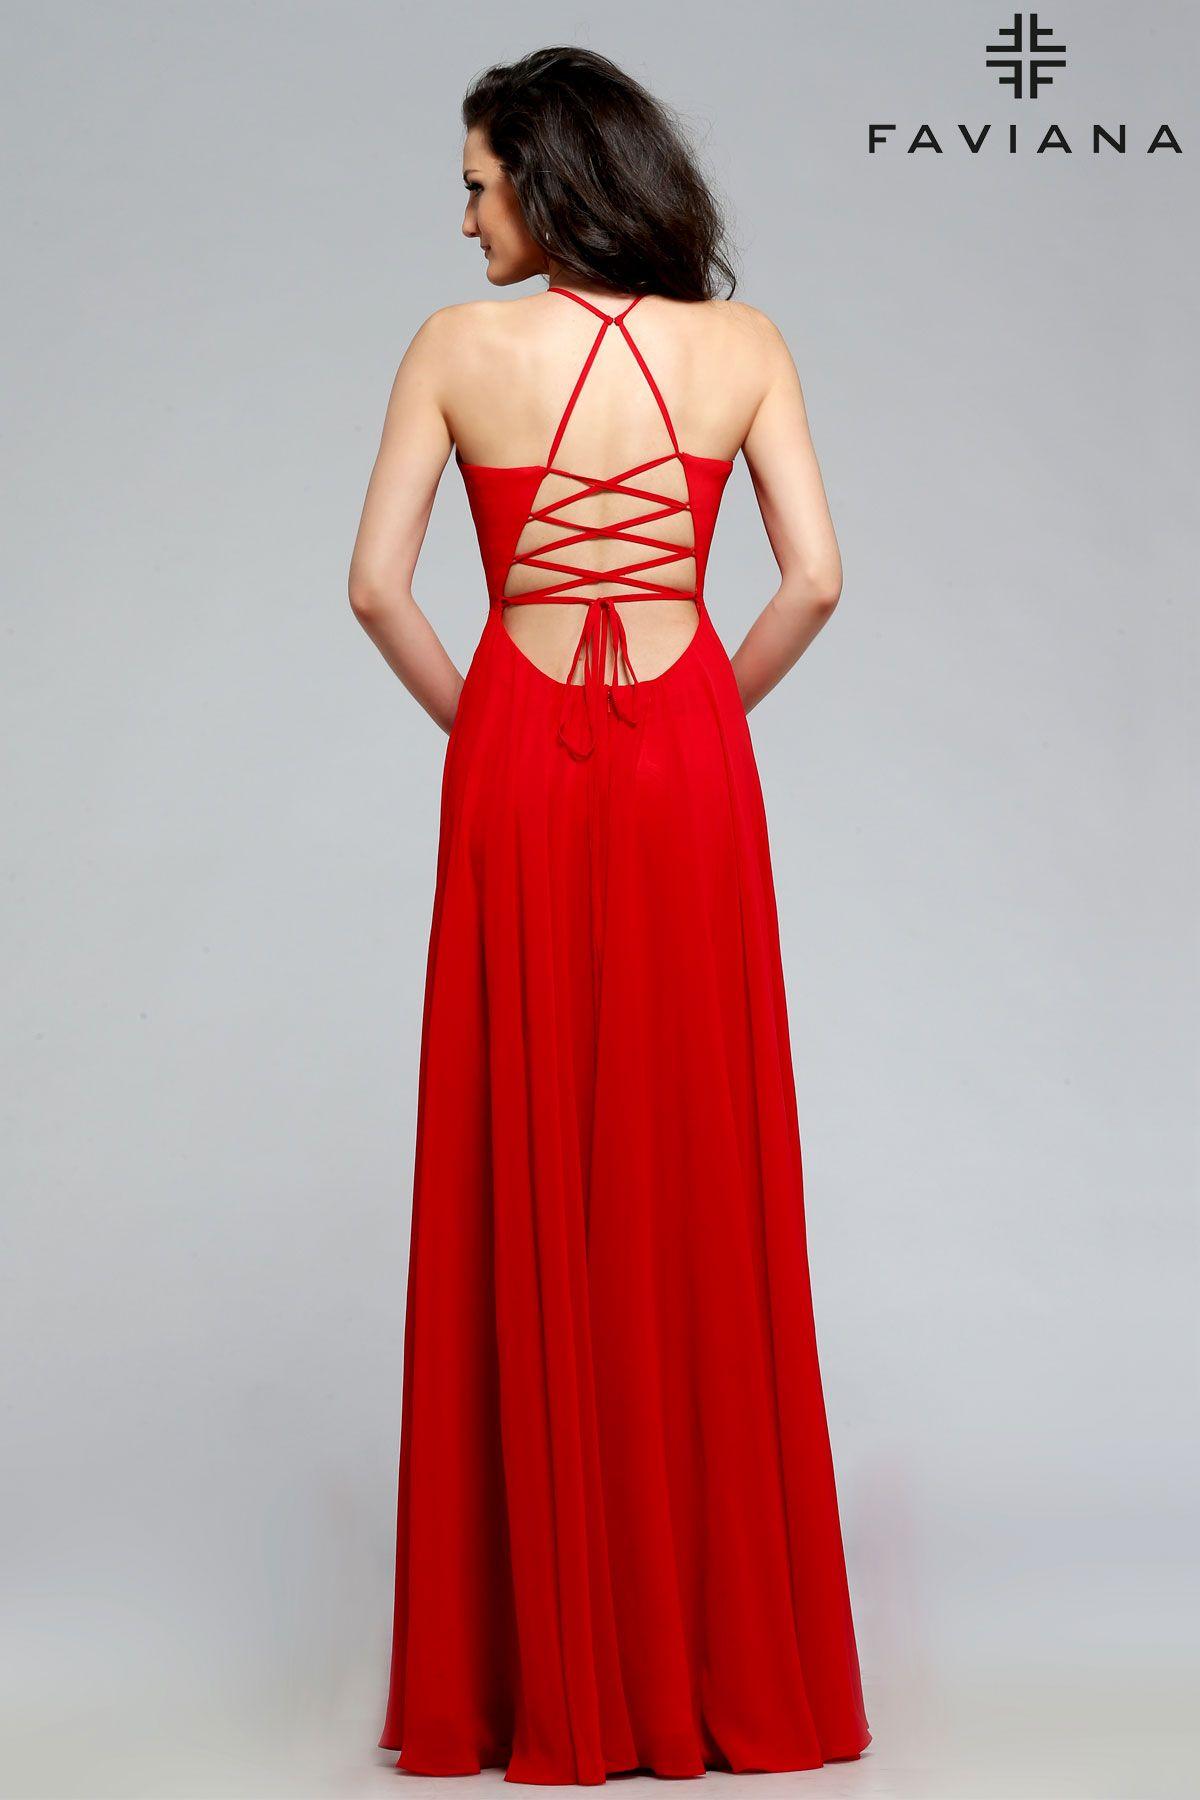 a7ef10db33e Chiffon v-neck with full skirt  Faviana Style 7747  PromDresses ...